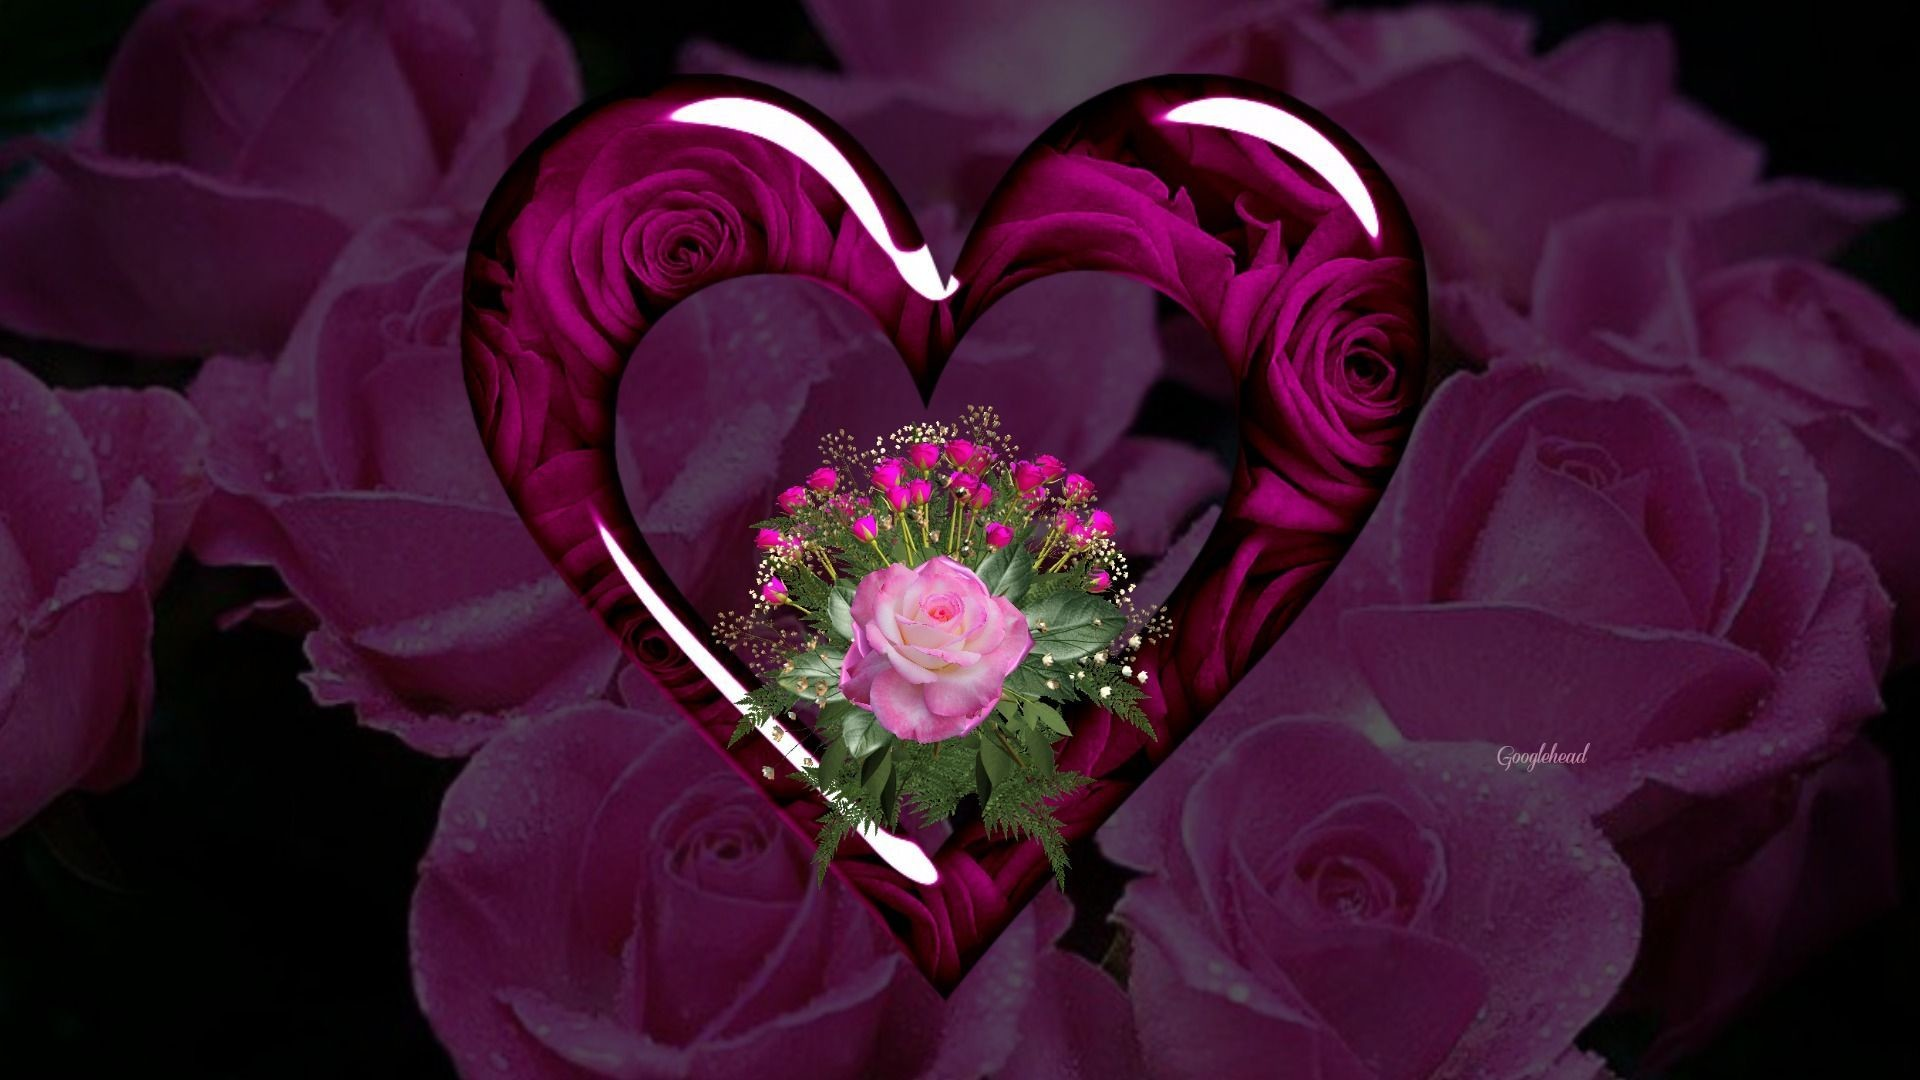 purple hearts and roses | Purple Hearts And Roses Wallpaper Red roses and  hearts wallpapers .